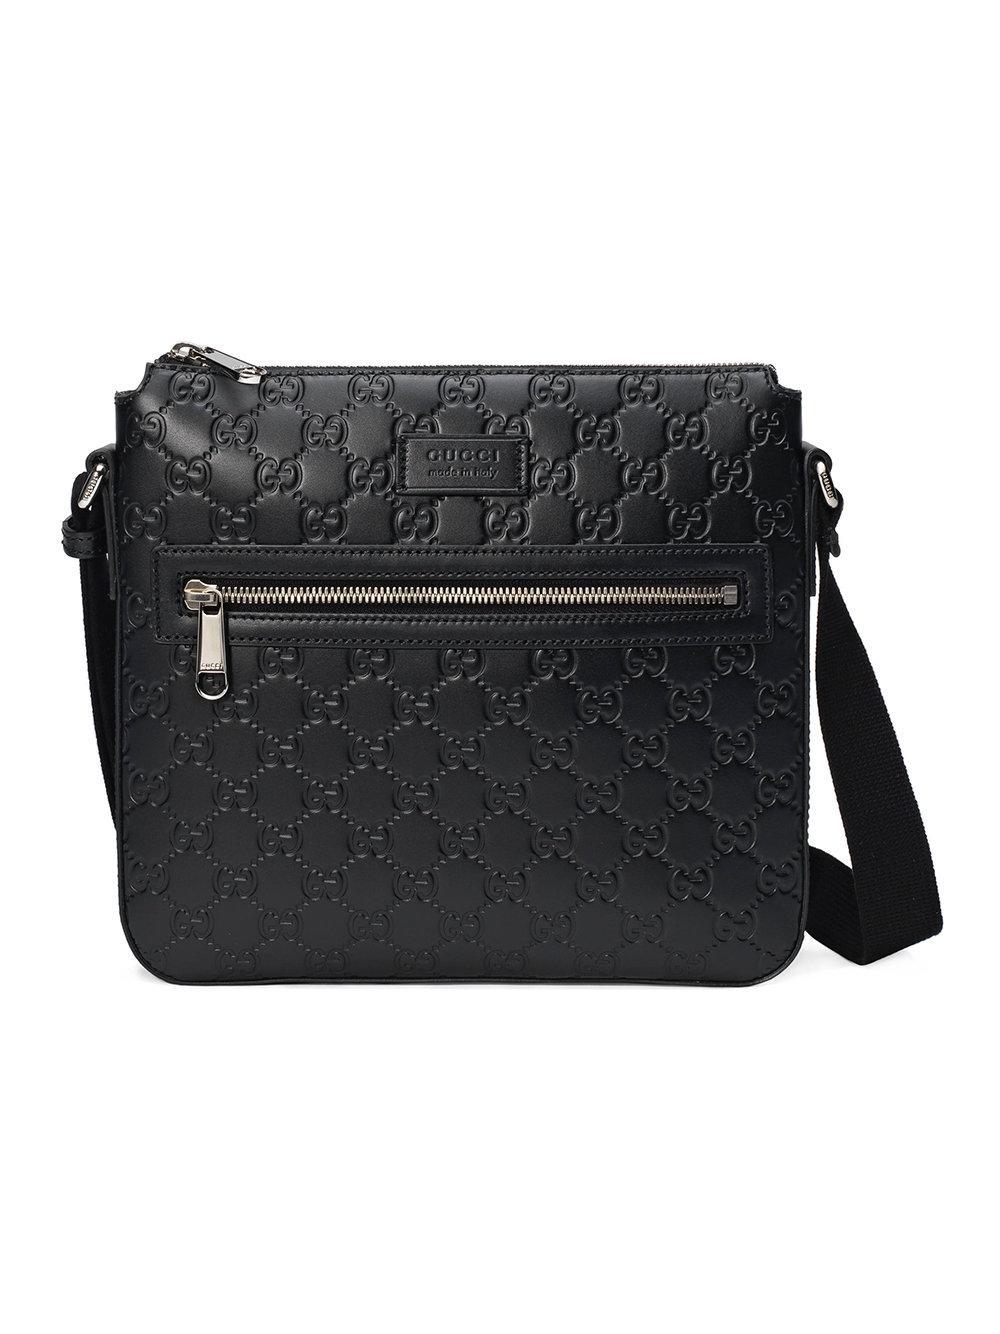 7cb6cbbb5b3 Gucci Signature Leather Messenger Bag